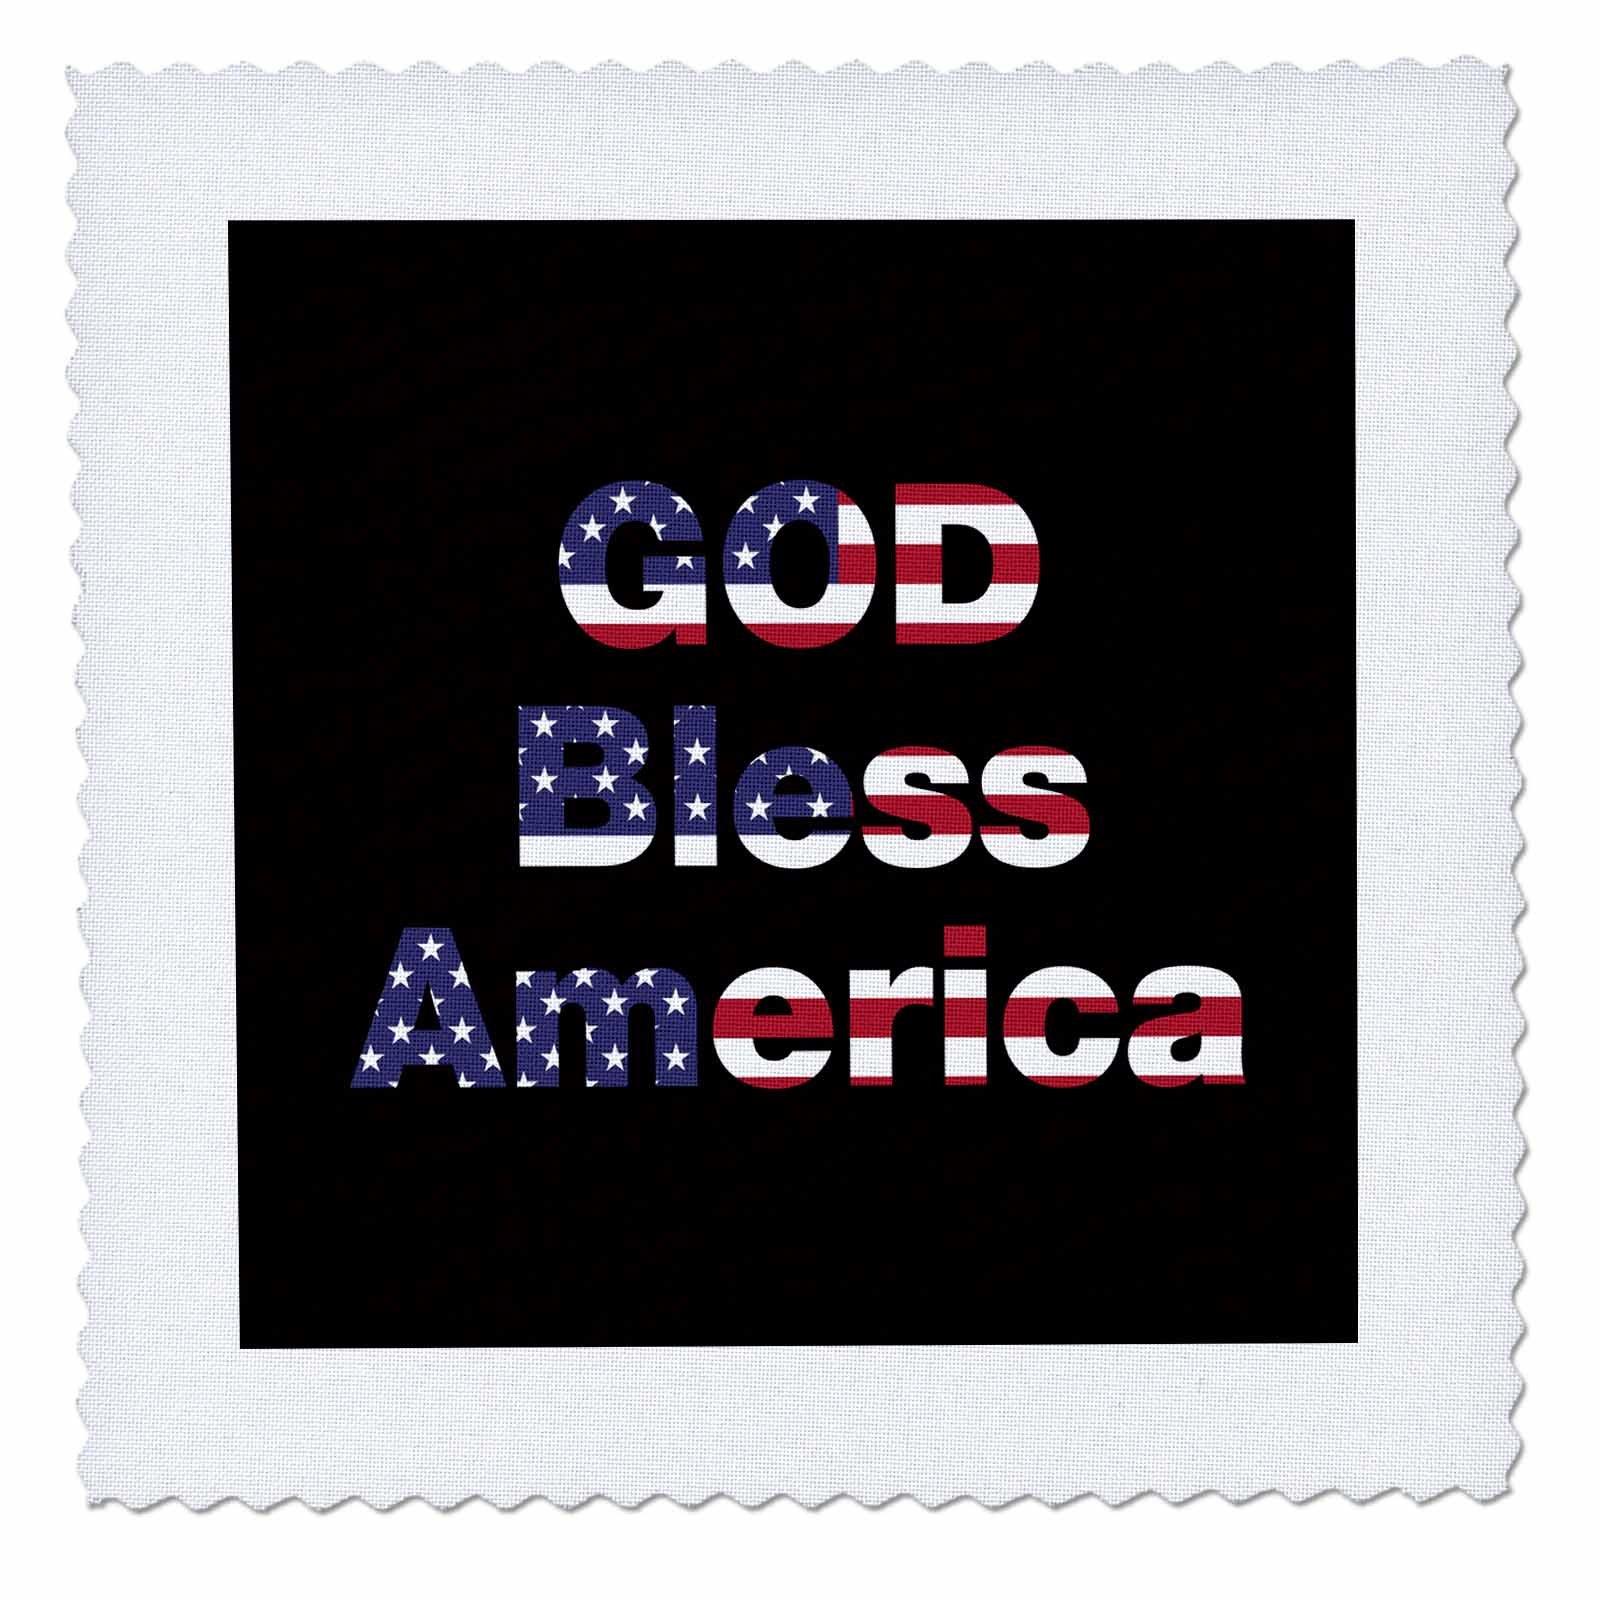 3dRose Uta Naumann Flags of the World - USA American Flag Stars and Stripes-Patriotic-God Bless America-Black - 25x25 inch quilt square (qs_268993_10)